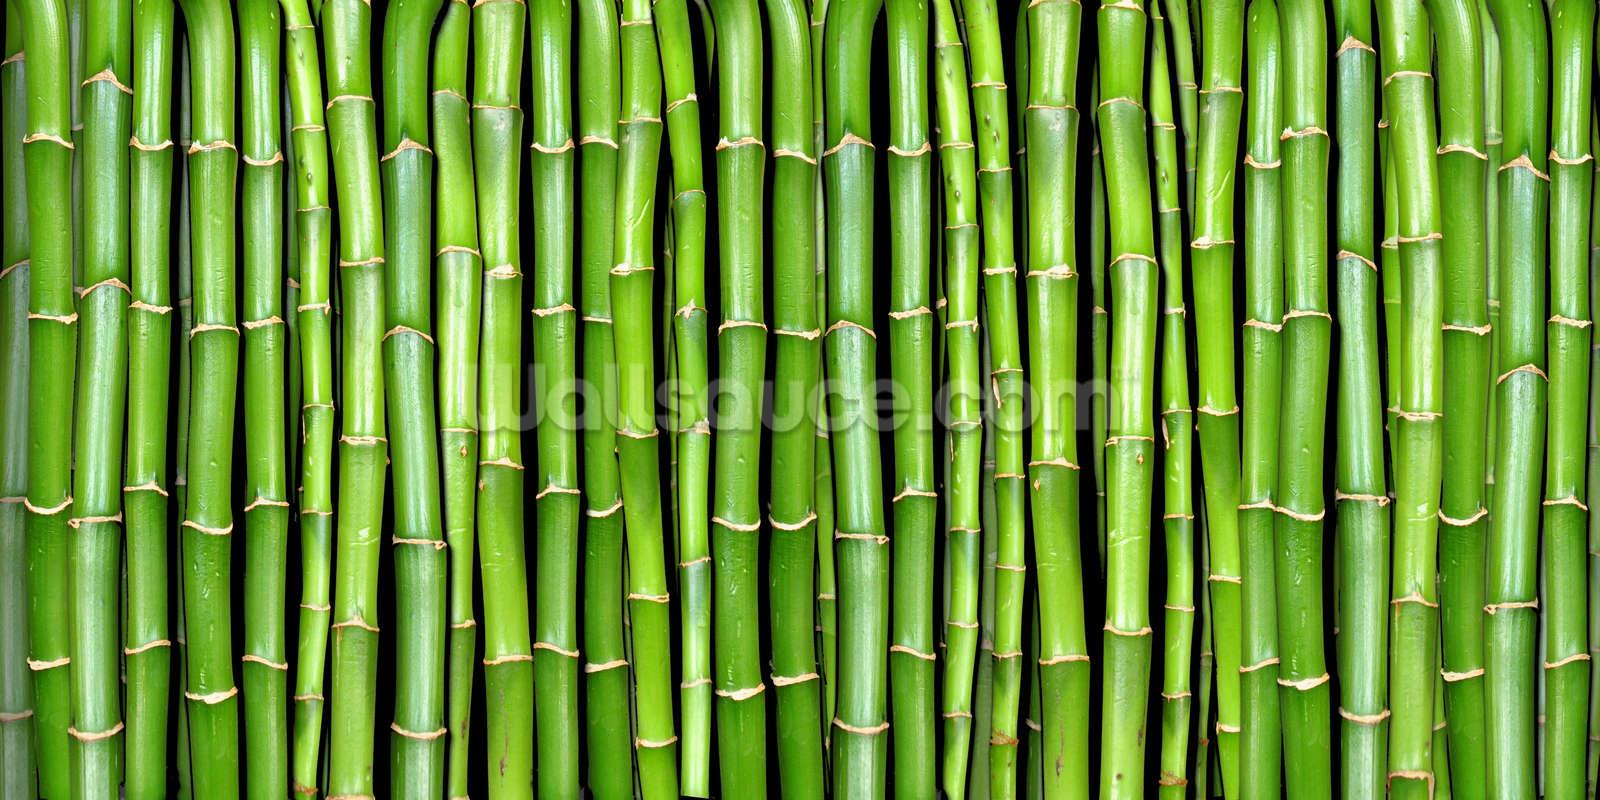 Bamboo Wallpaper Mural Wallsauce AU